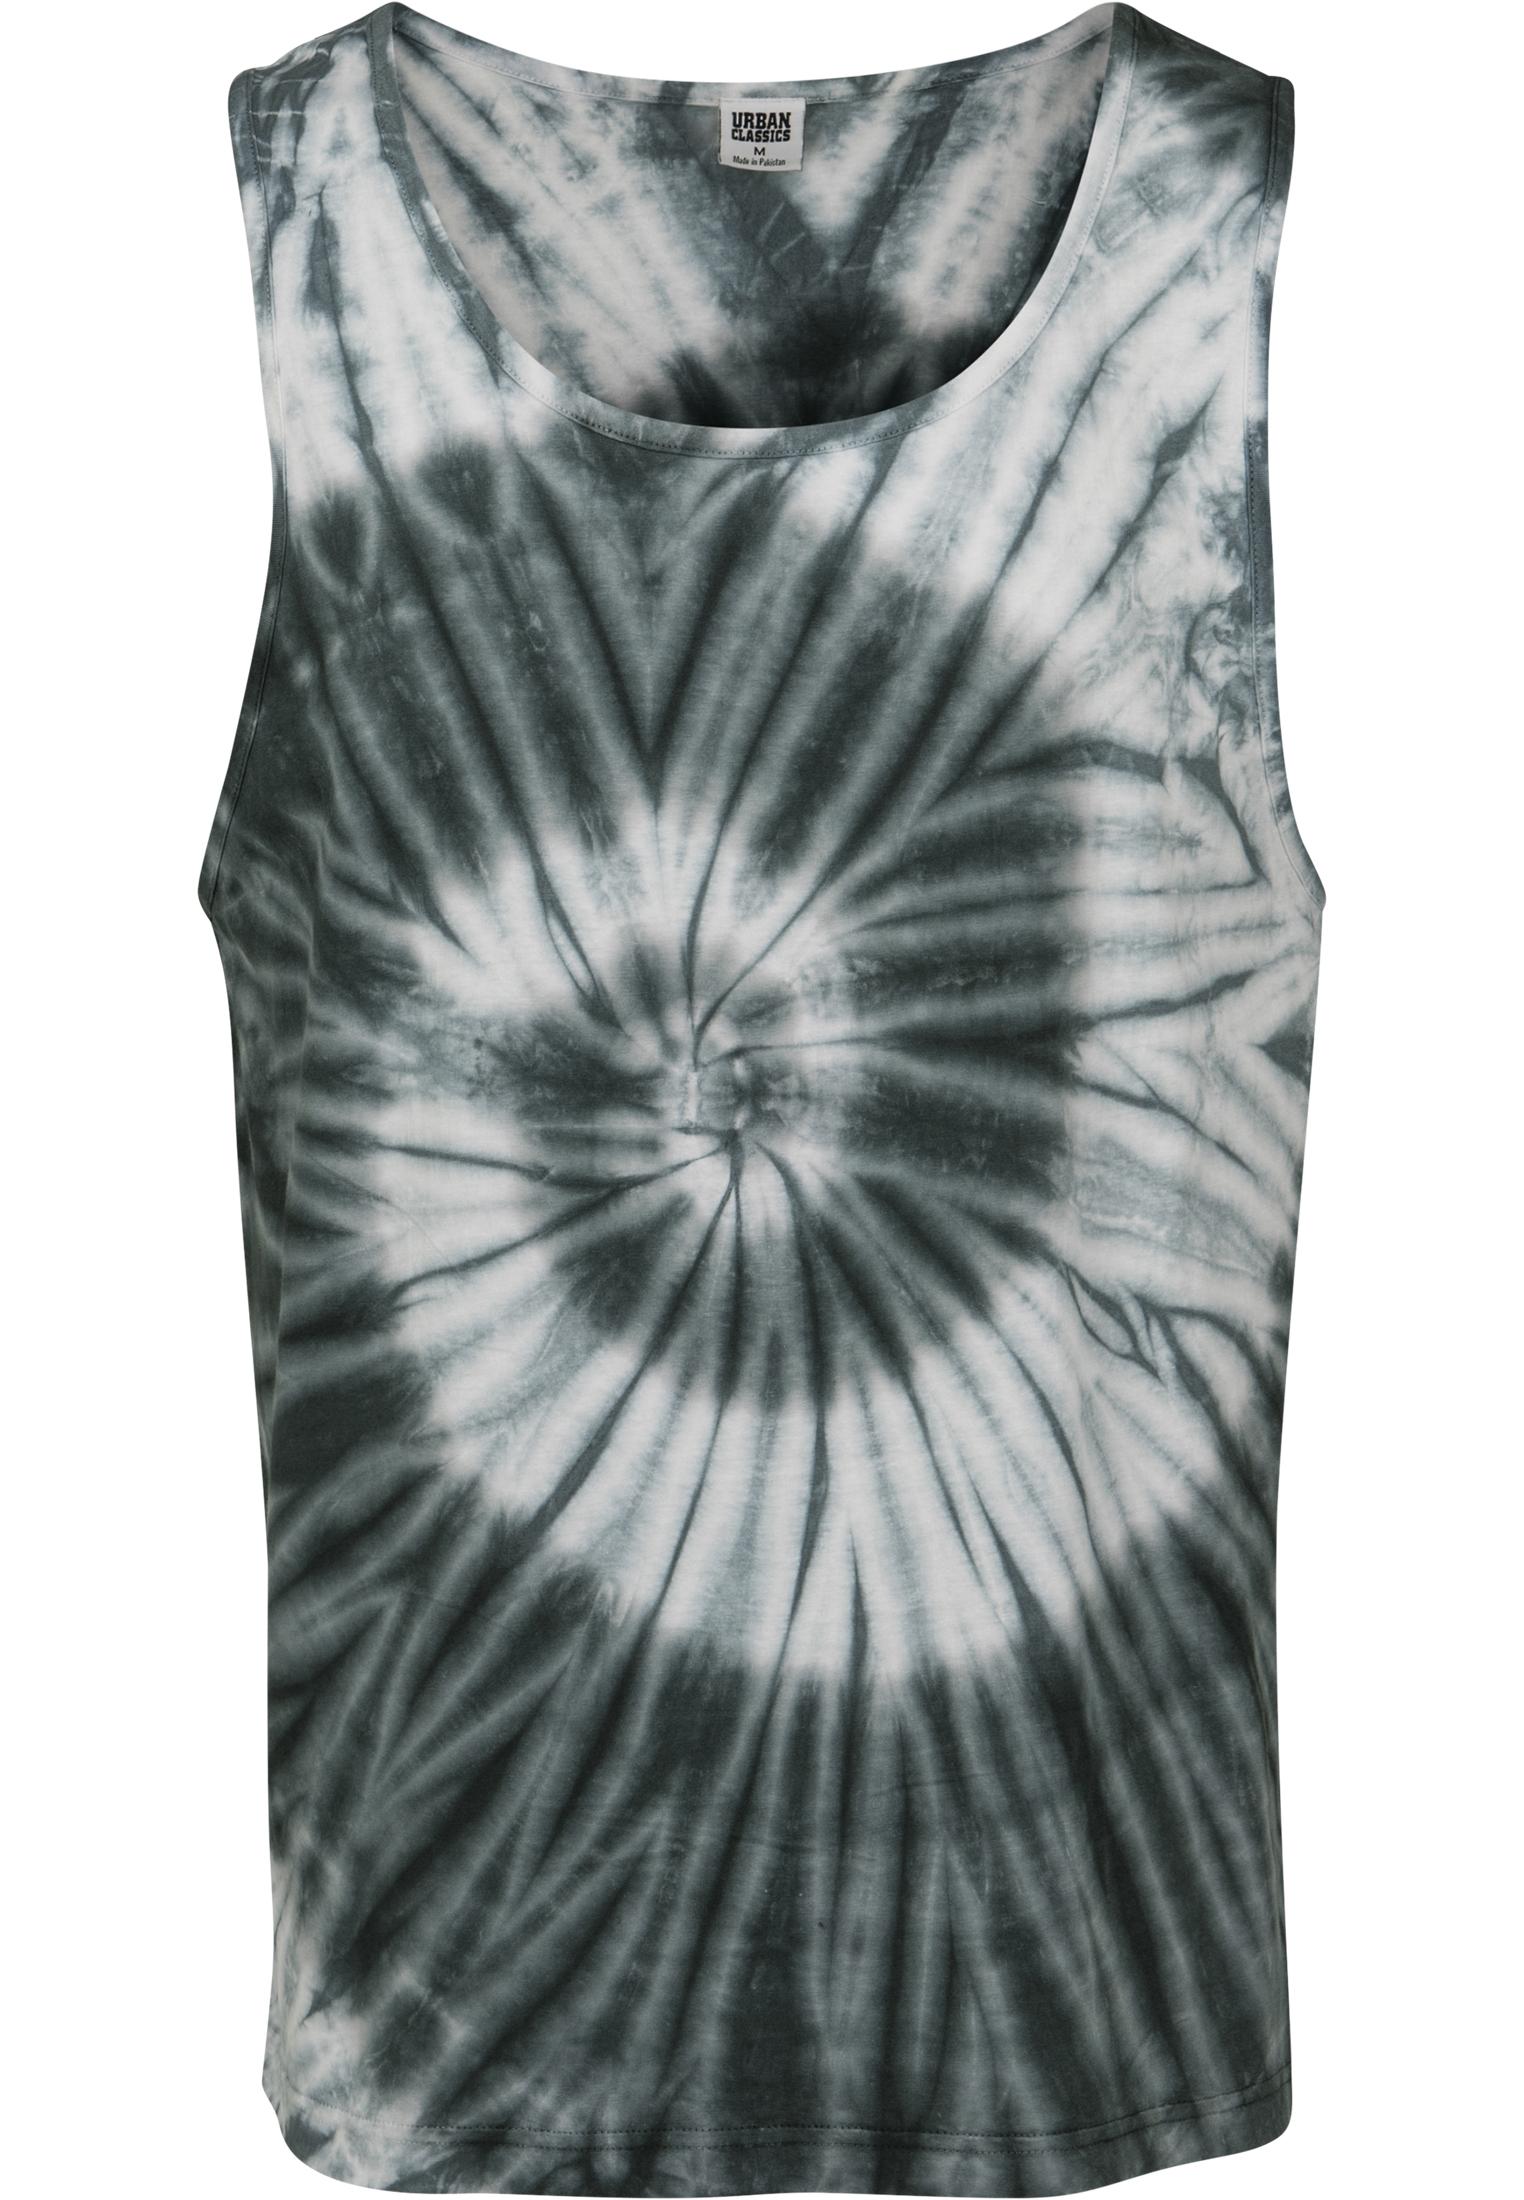 Urban Classics Mens Spiral Tie Dye Tank Sports Top